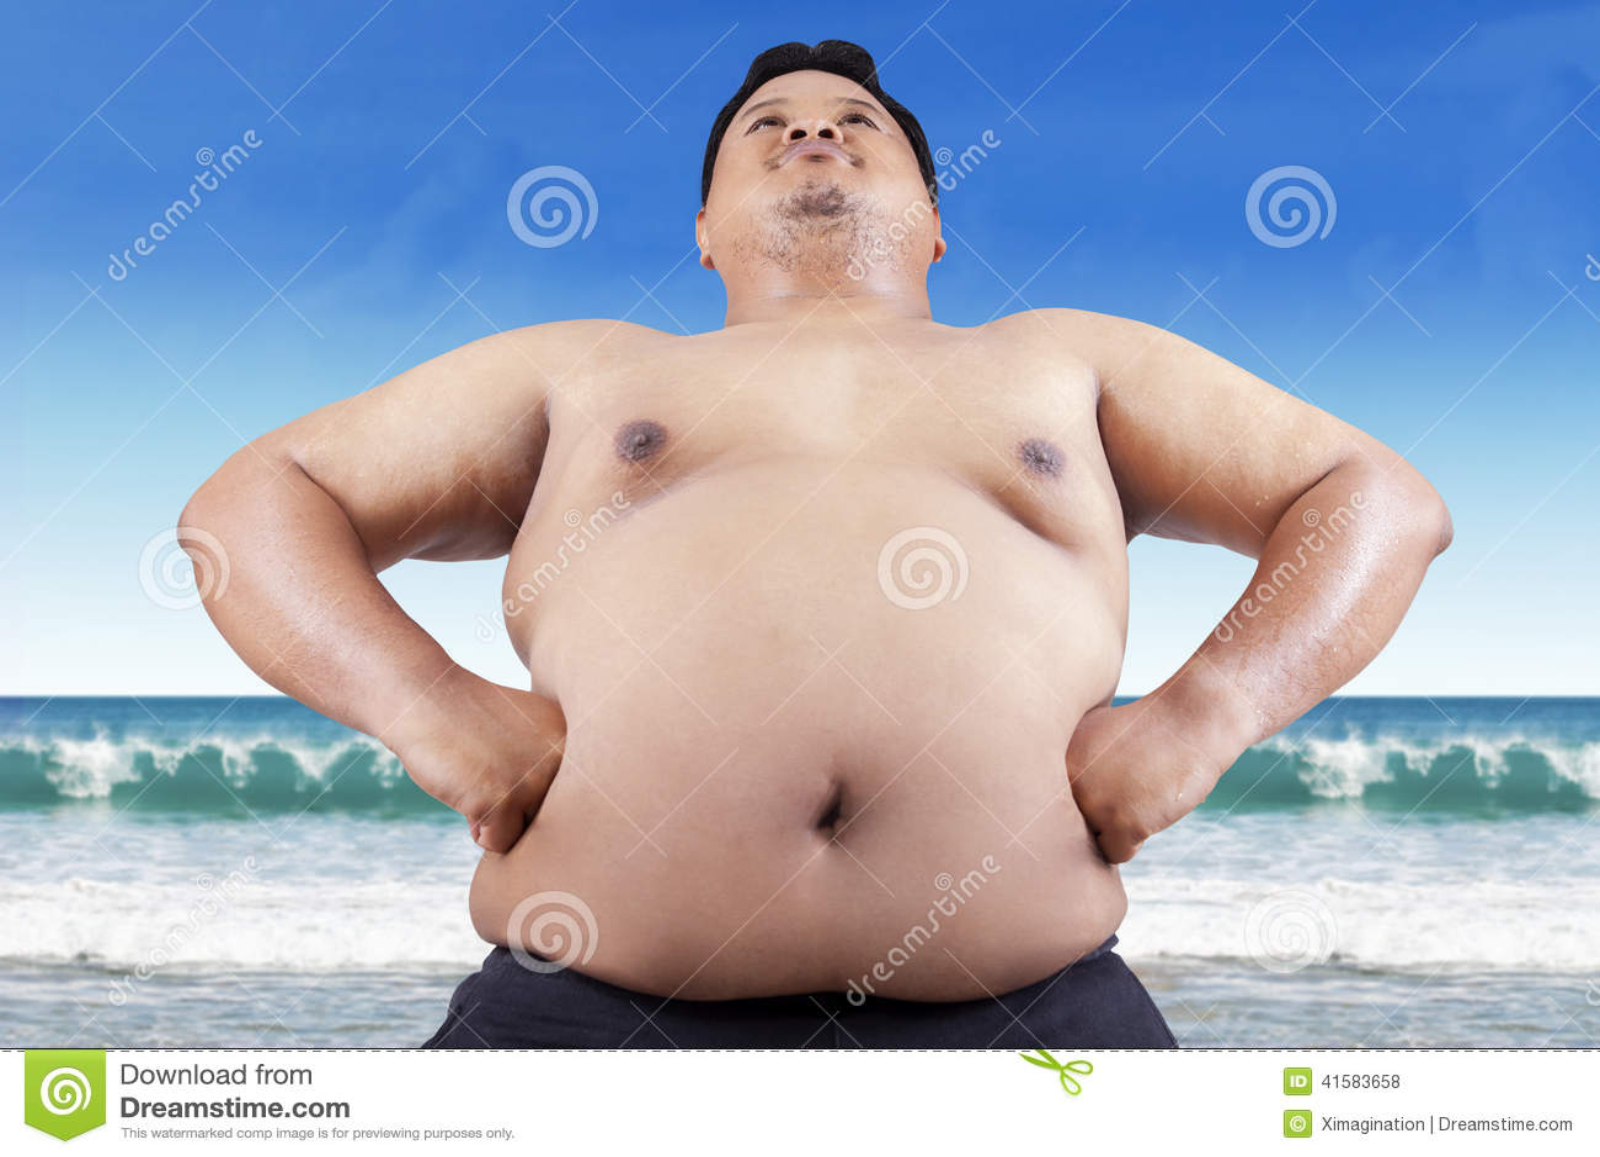 Fat men on beach